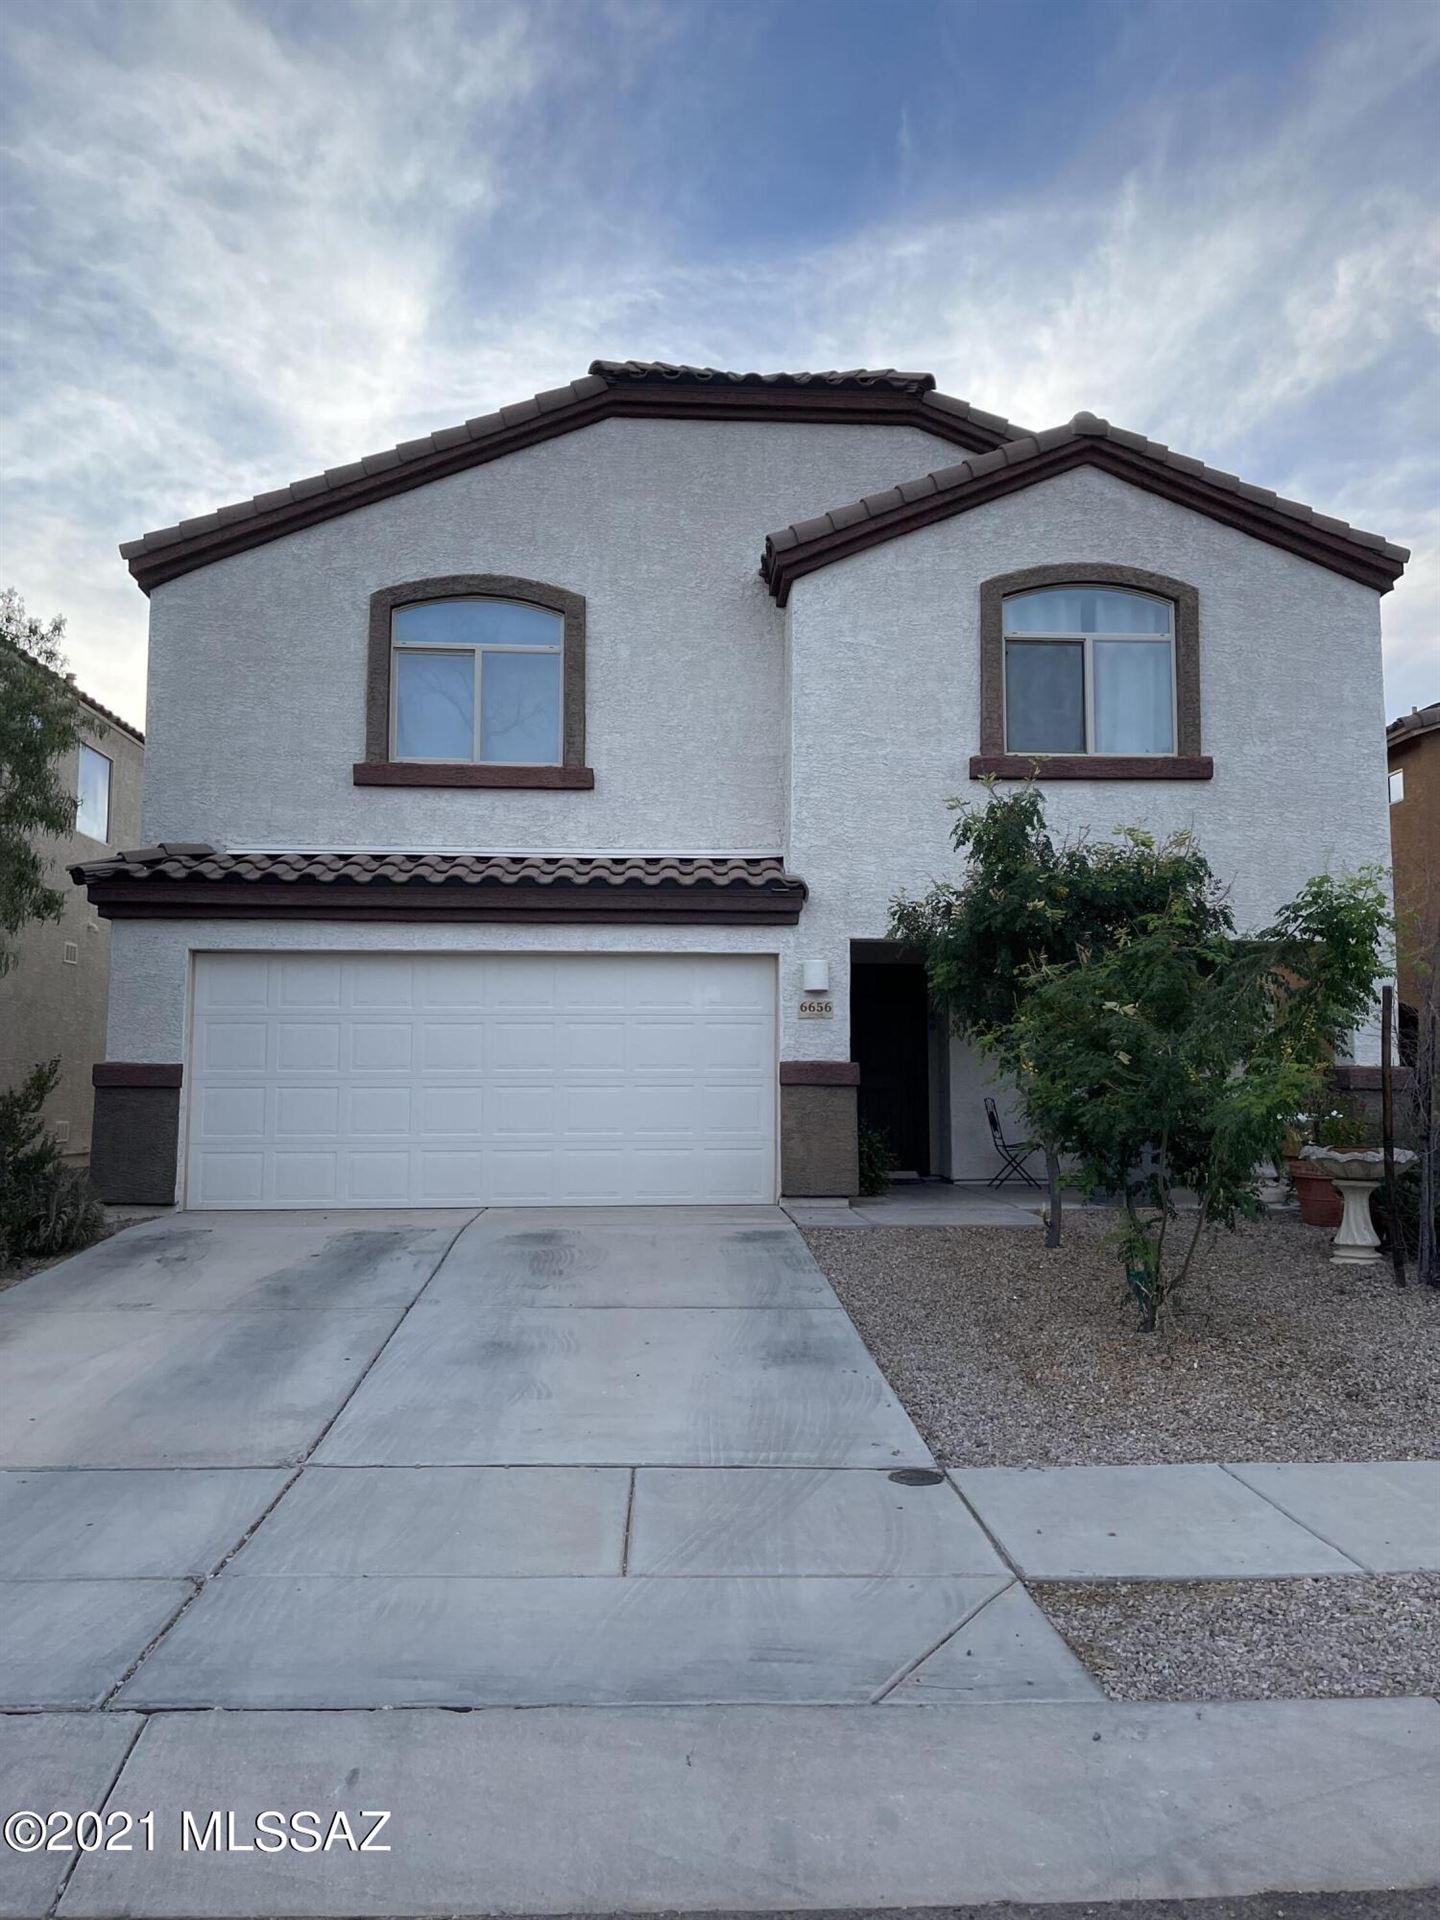 6656 S Blue Wing Drive, Tucson, AZ 85757 - MLS#: 22124764